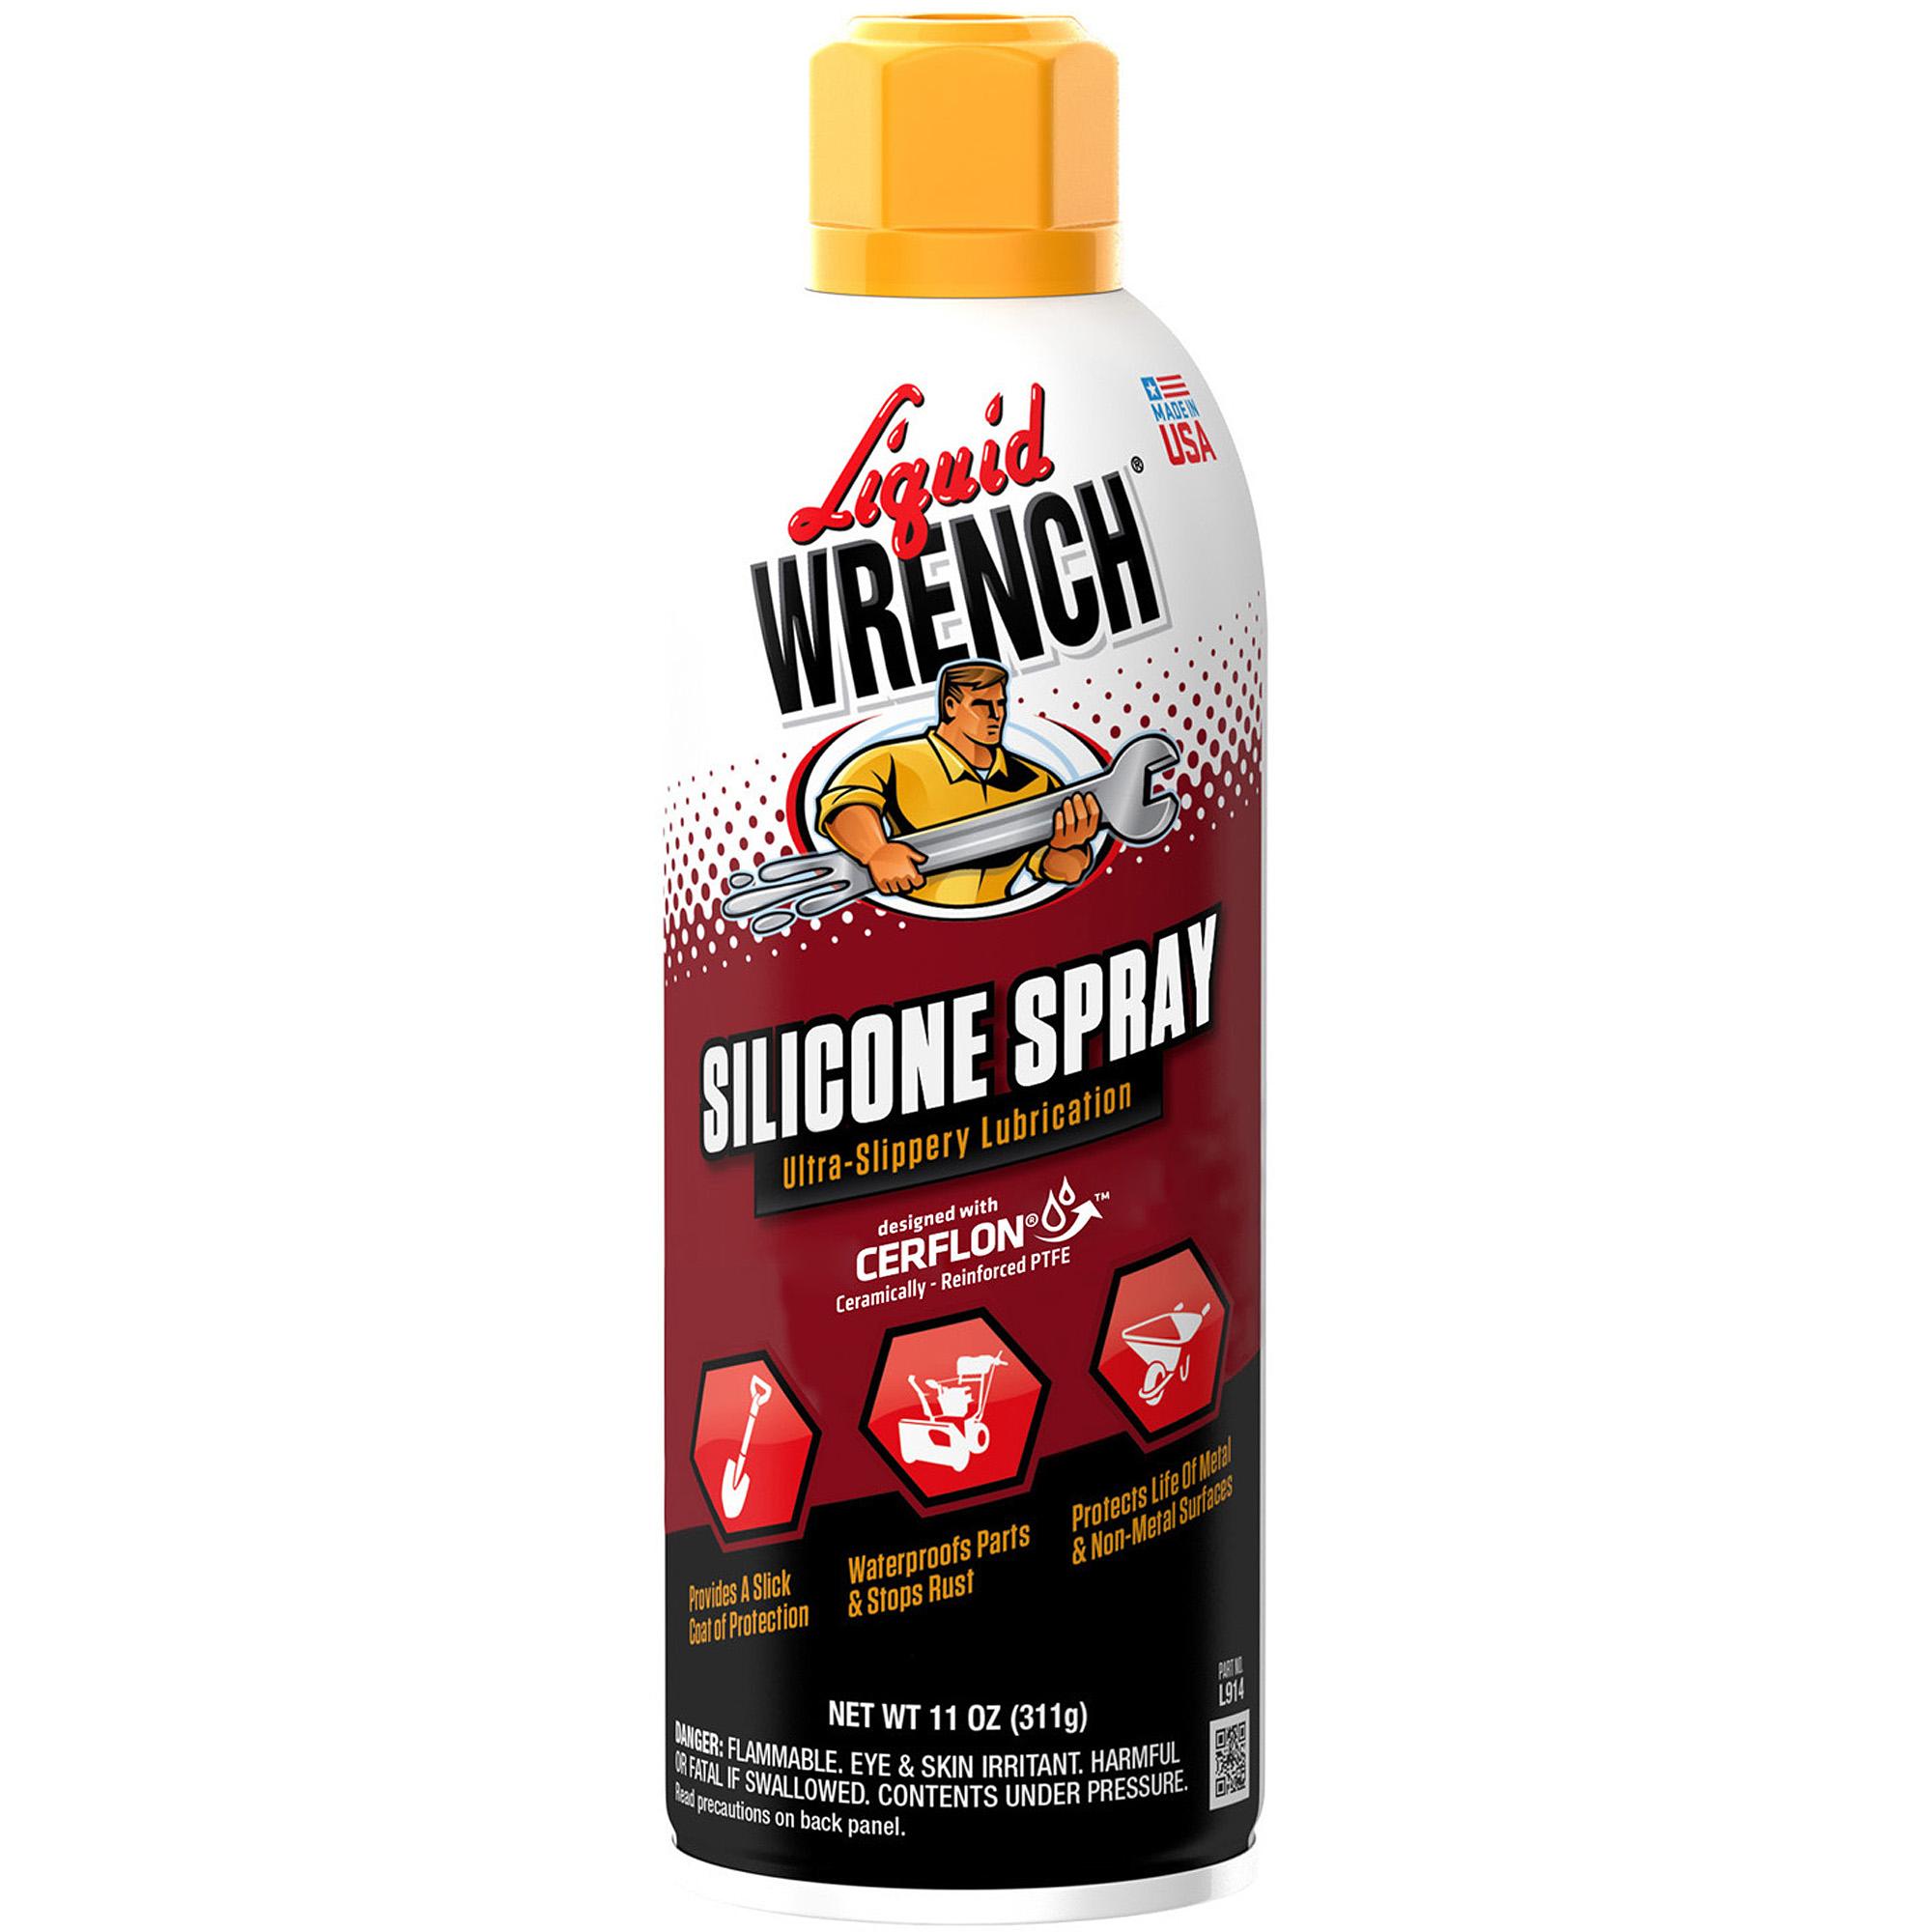 Liquid Wrench Silicone Spray, 11 oz